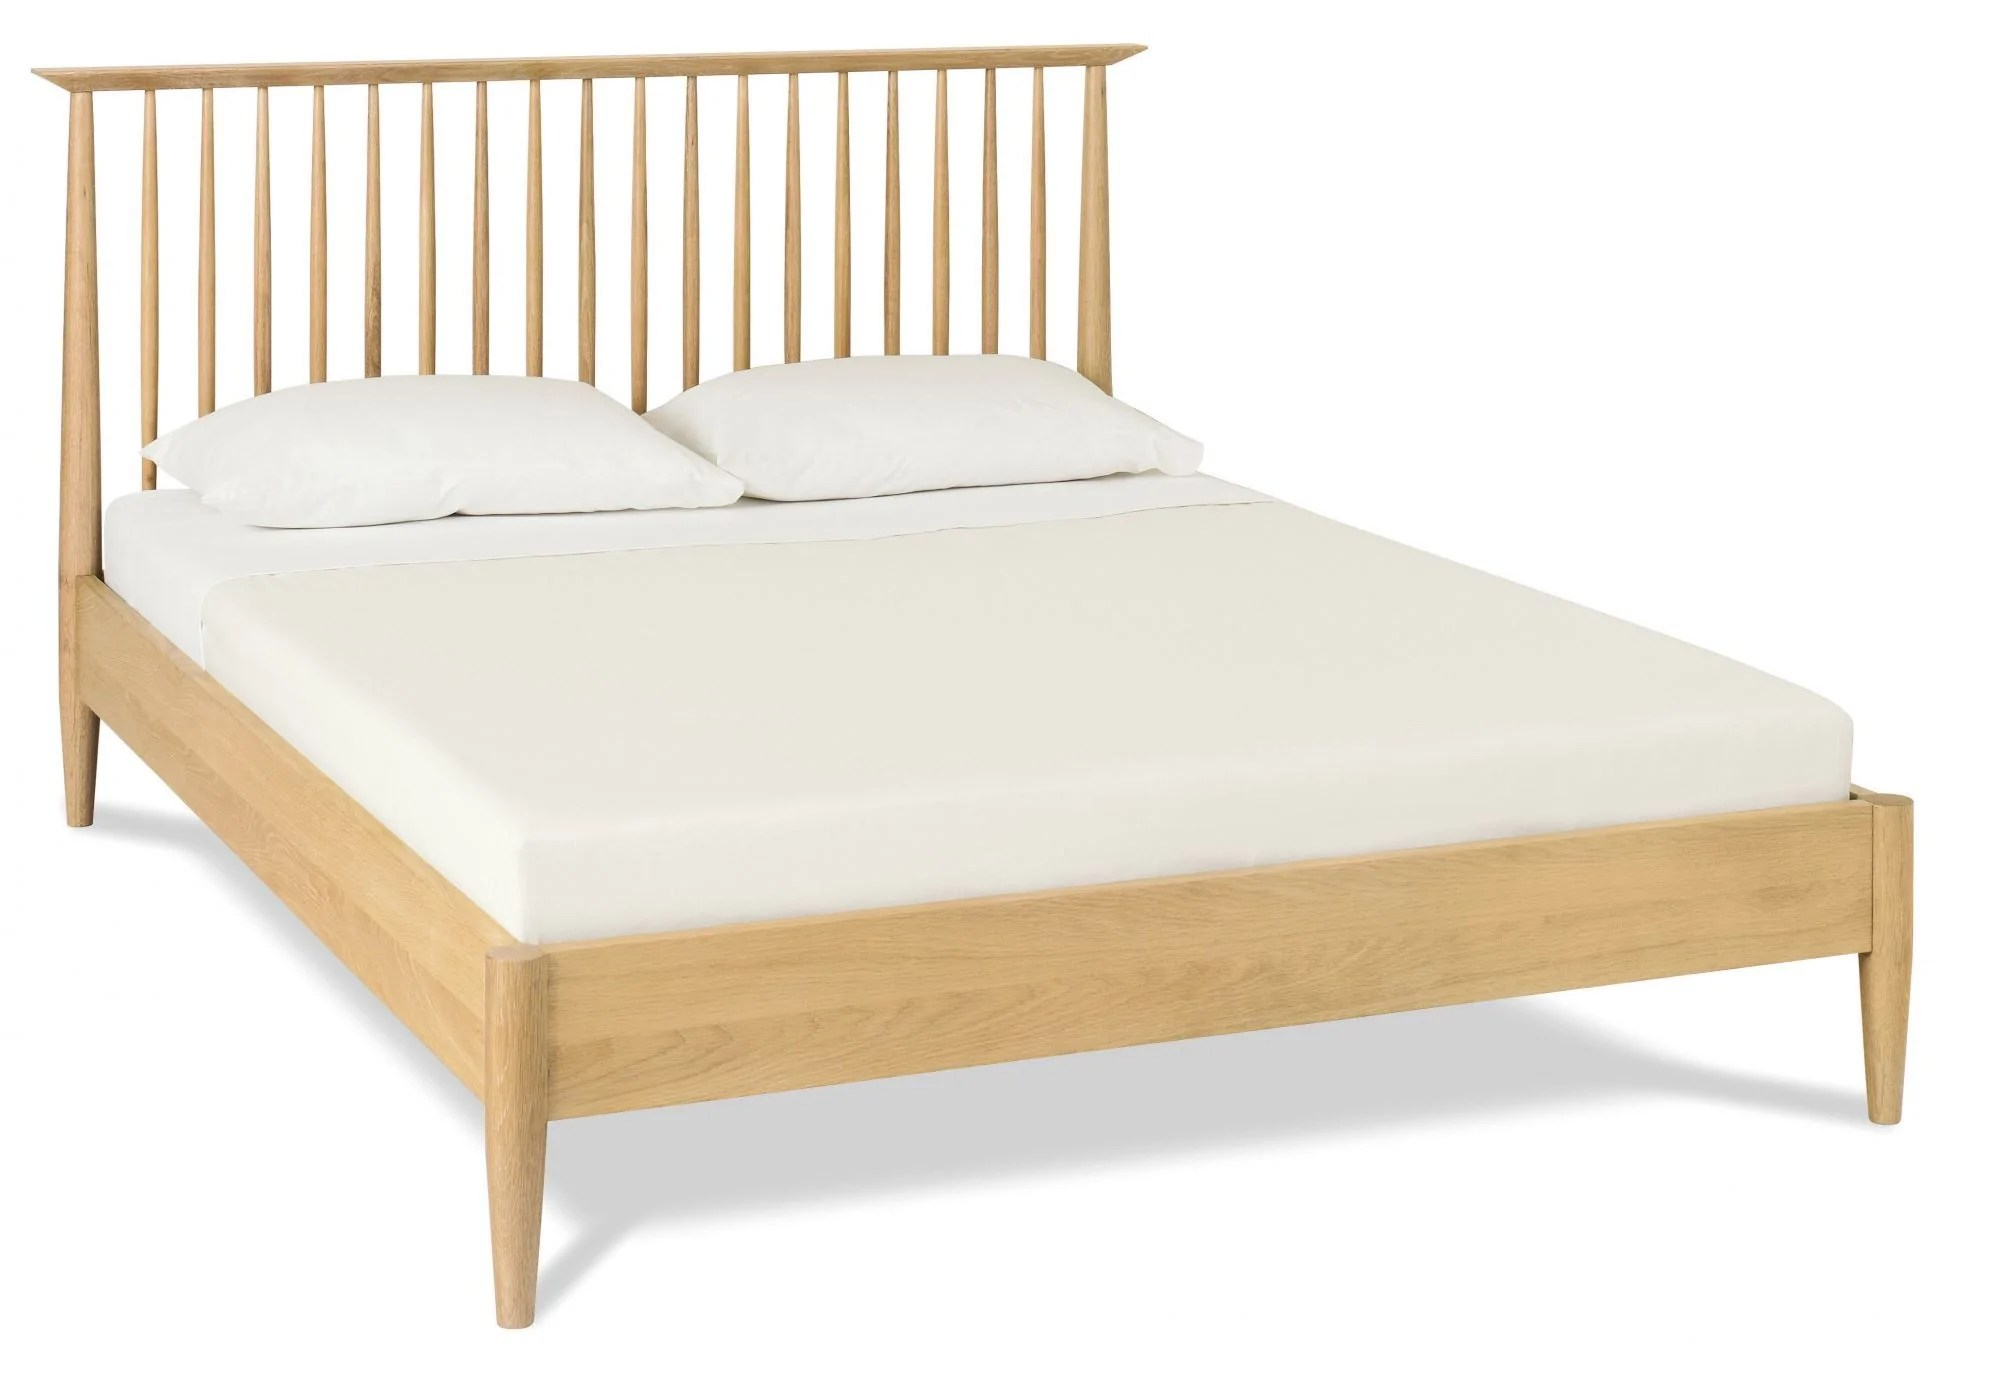 Asta 150cm Queen Low Spindle Wooden Bed Base Interior Secrets